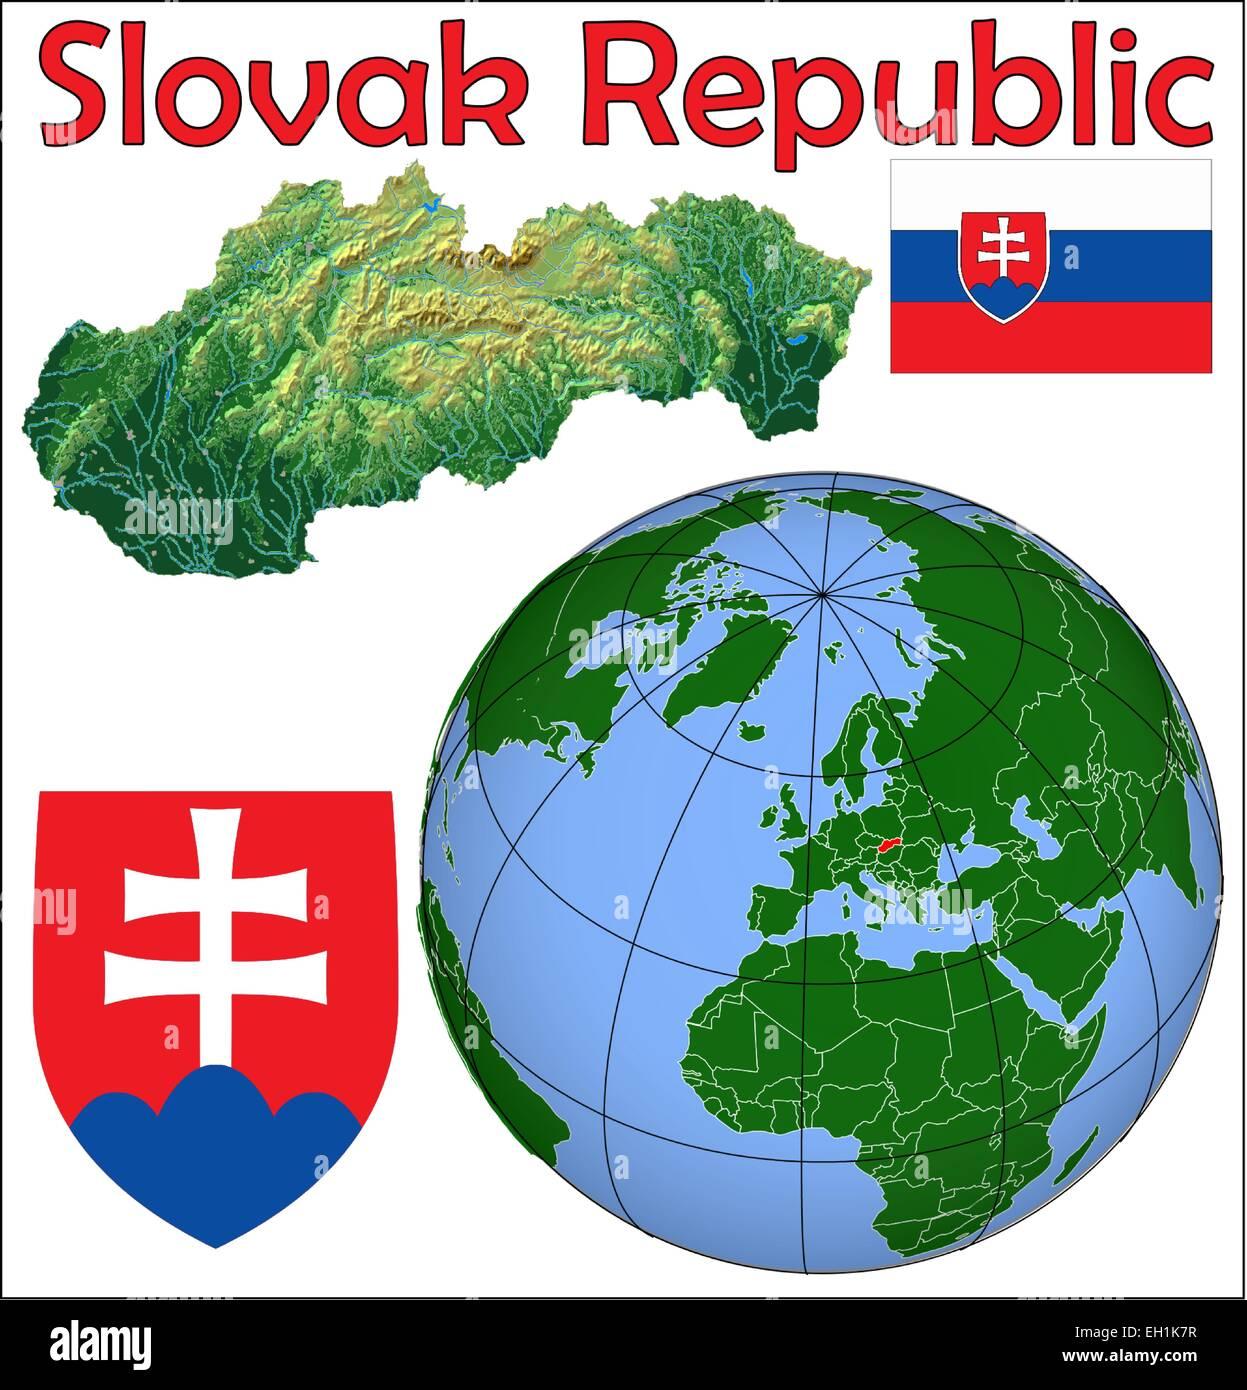 Slovakia Map Stock Photos & Slovakia Map Stock Images - Alamy